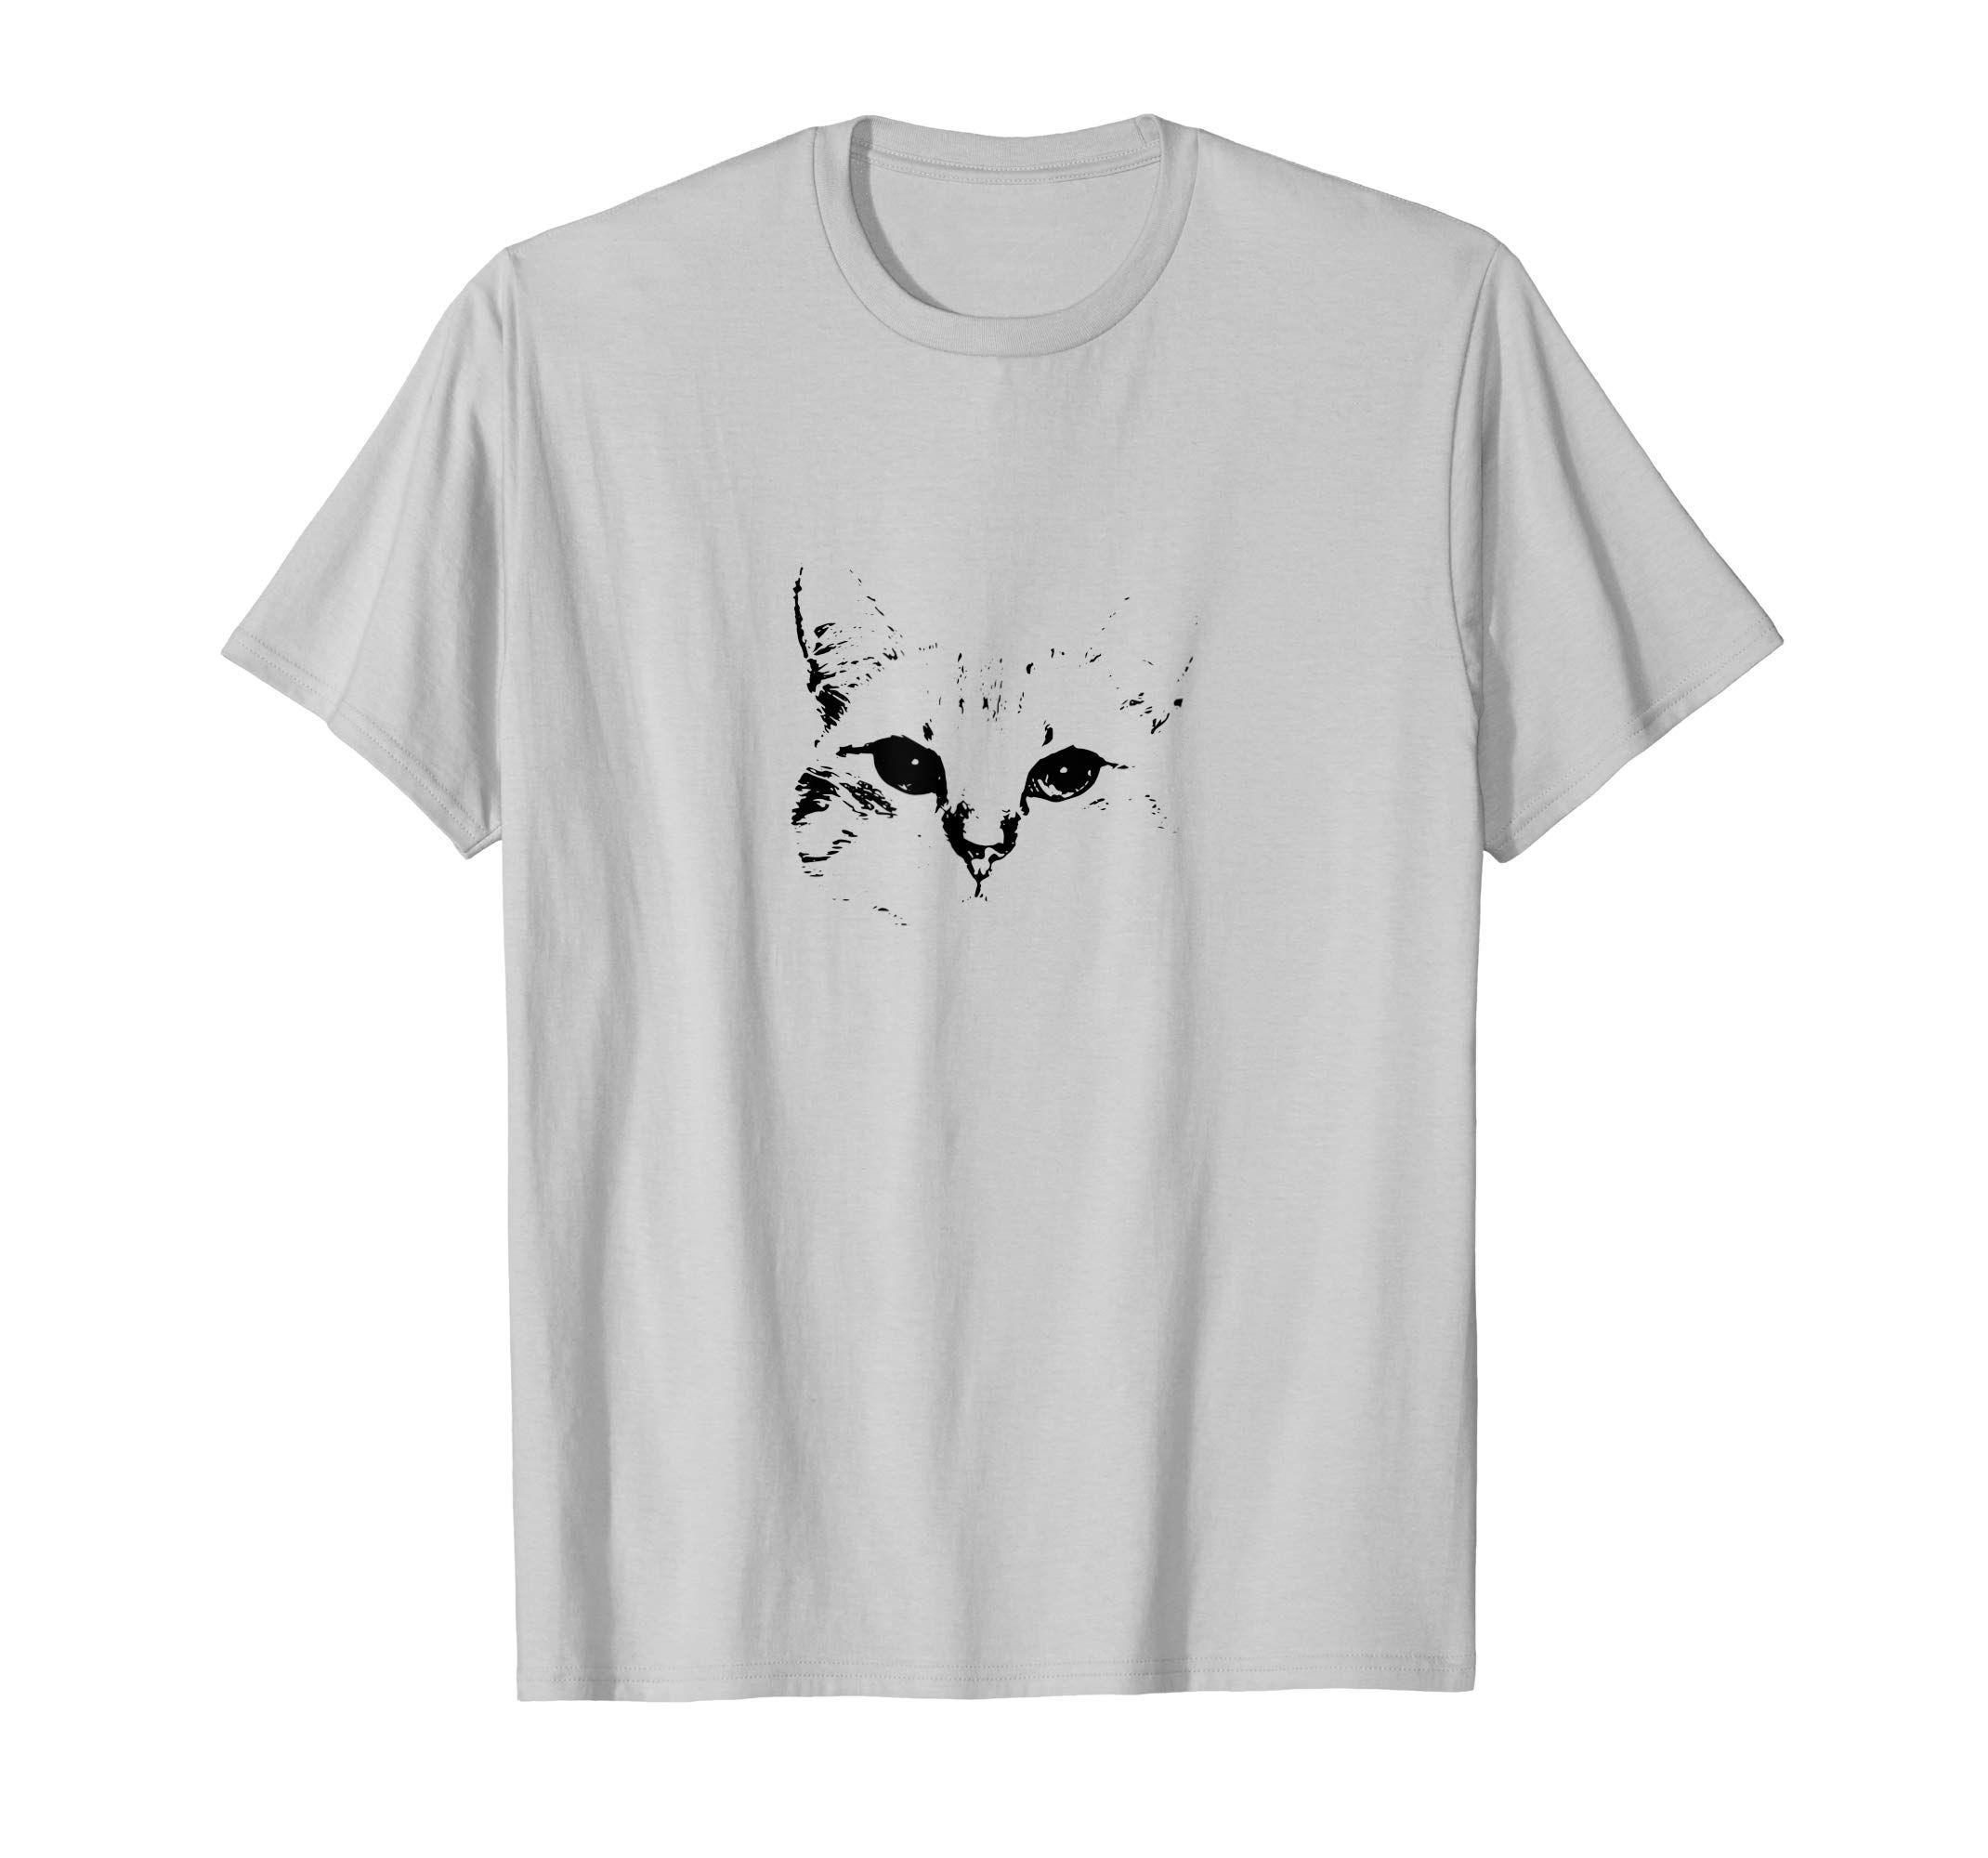 Amazon Com Cat T Shirt Cat Lover Tshirt Pet Animal Tee Kitten Kitty Clothing Tree Tee Shirt Tee Shirts Cool T Shirts